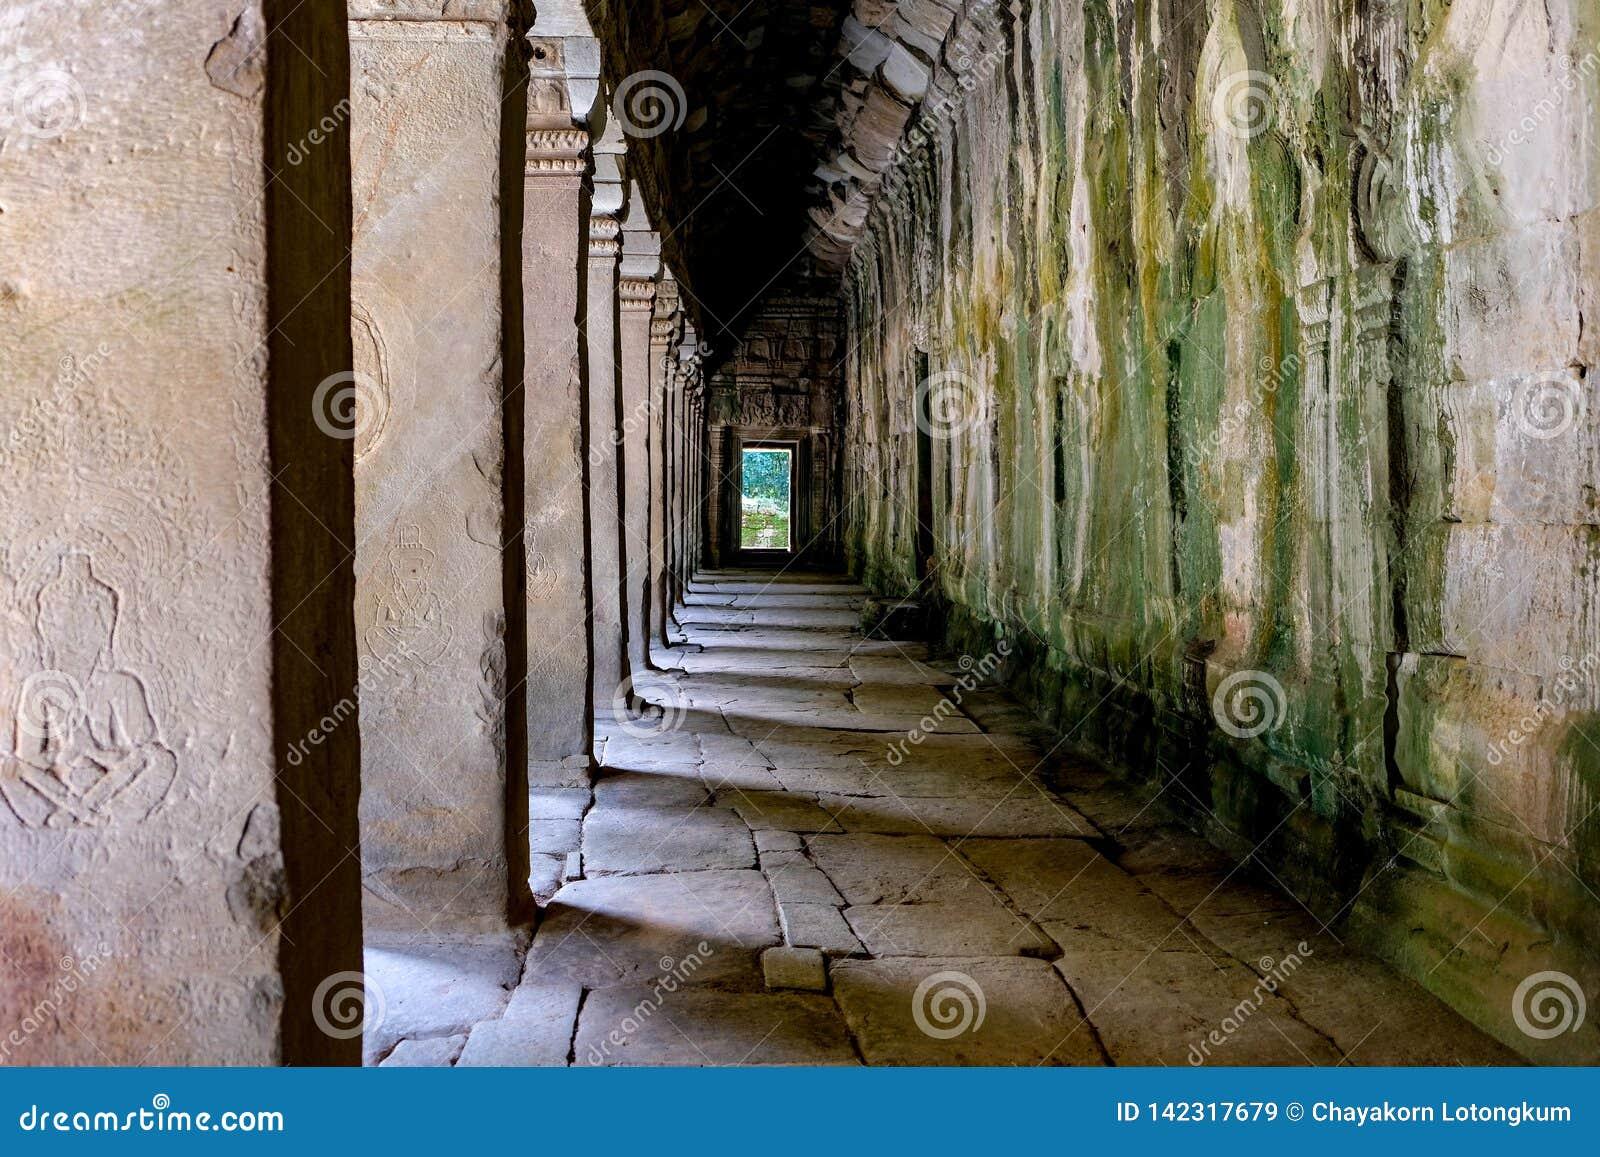 Detalle de la puerta antigua en TA Prohm Angkor Wat Cambodia